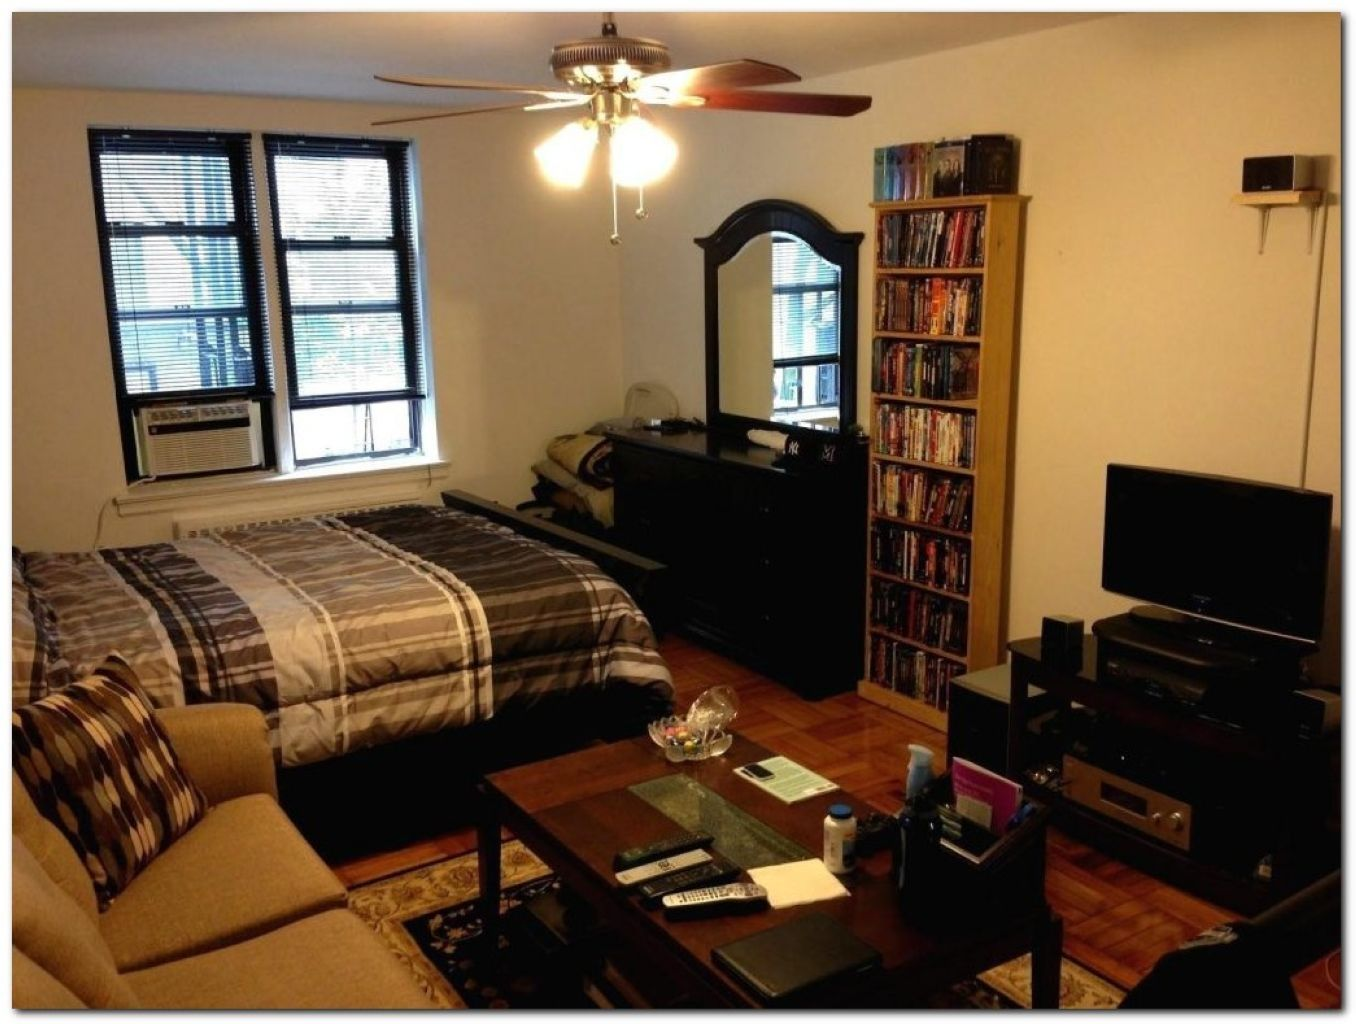 1 bedroom apartments midtown memphis tn%0A empty apartment   Flirt for Hire   Pinterest   Flirting  Apartments and  Graham